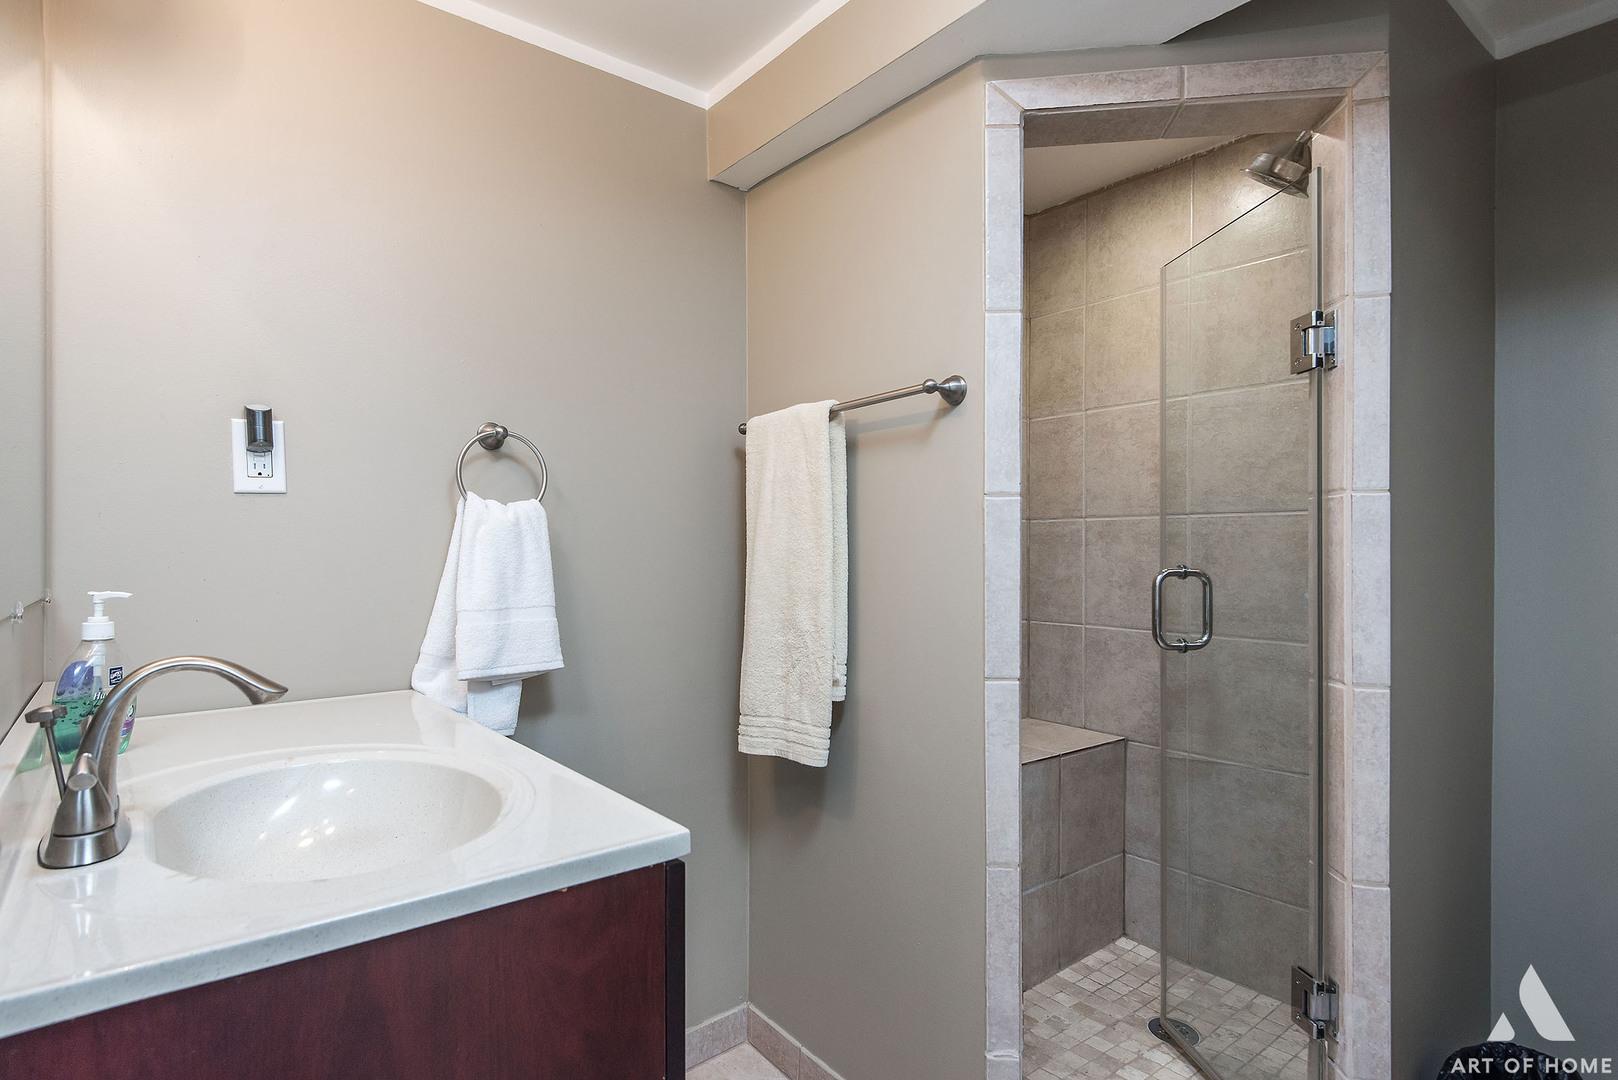 6326 Komensky Avenue, Chicago, Illinois 60629, 5 Bedrooms Bedrooms, ,3 BathroomsBathrooms,Residential,For Sale,Komensky,MRD11178220